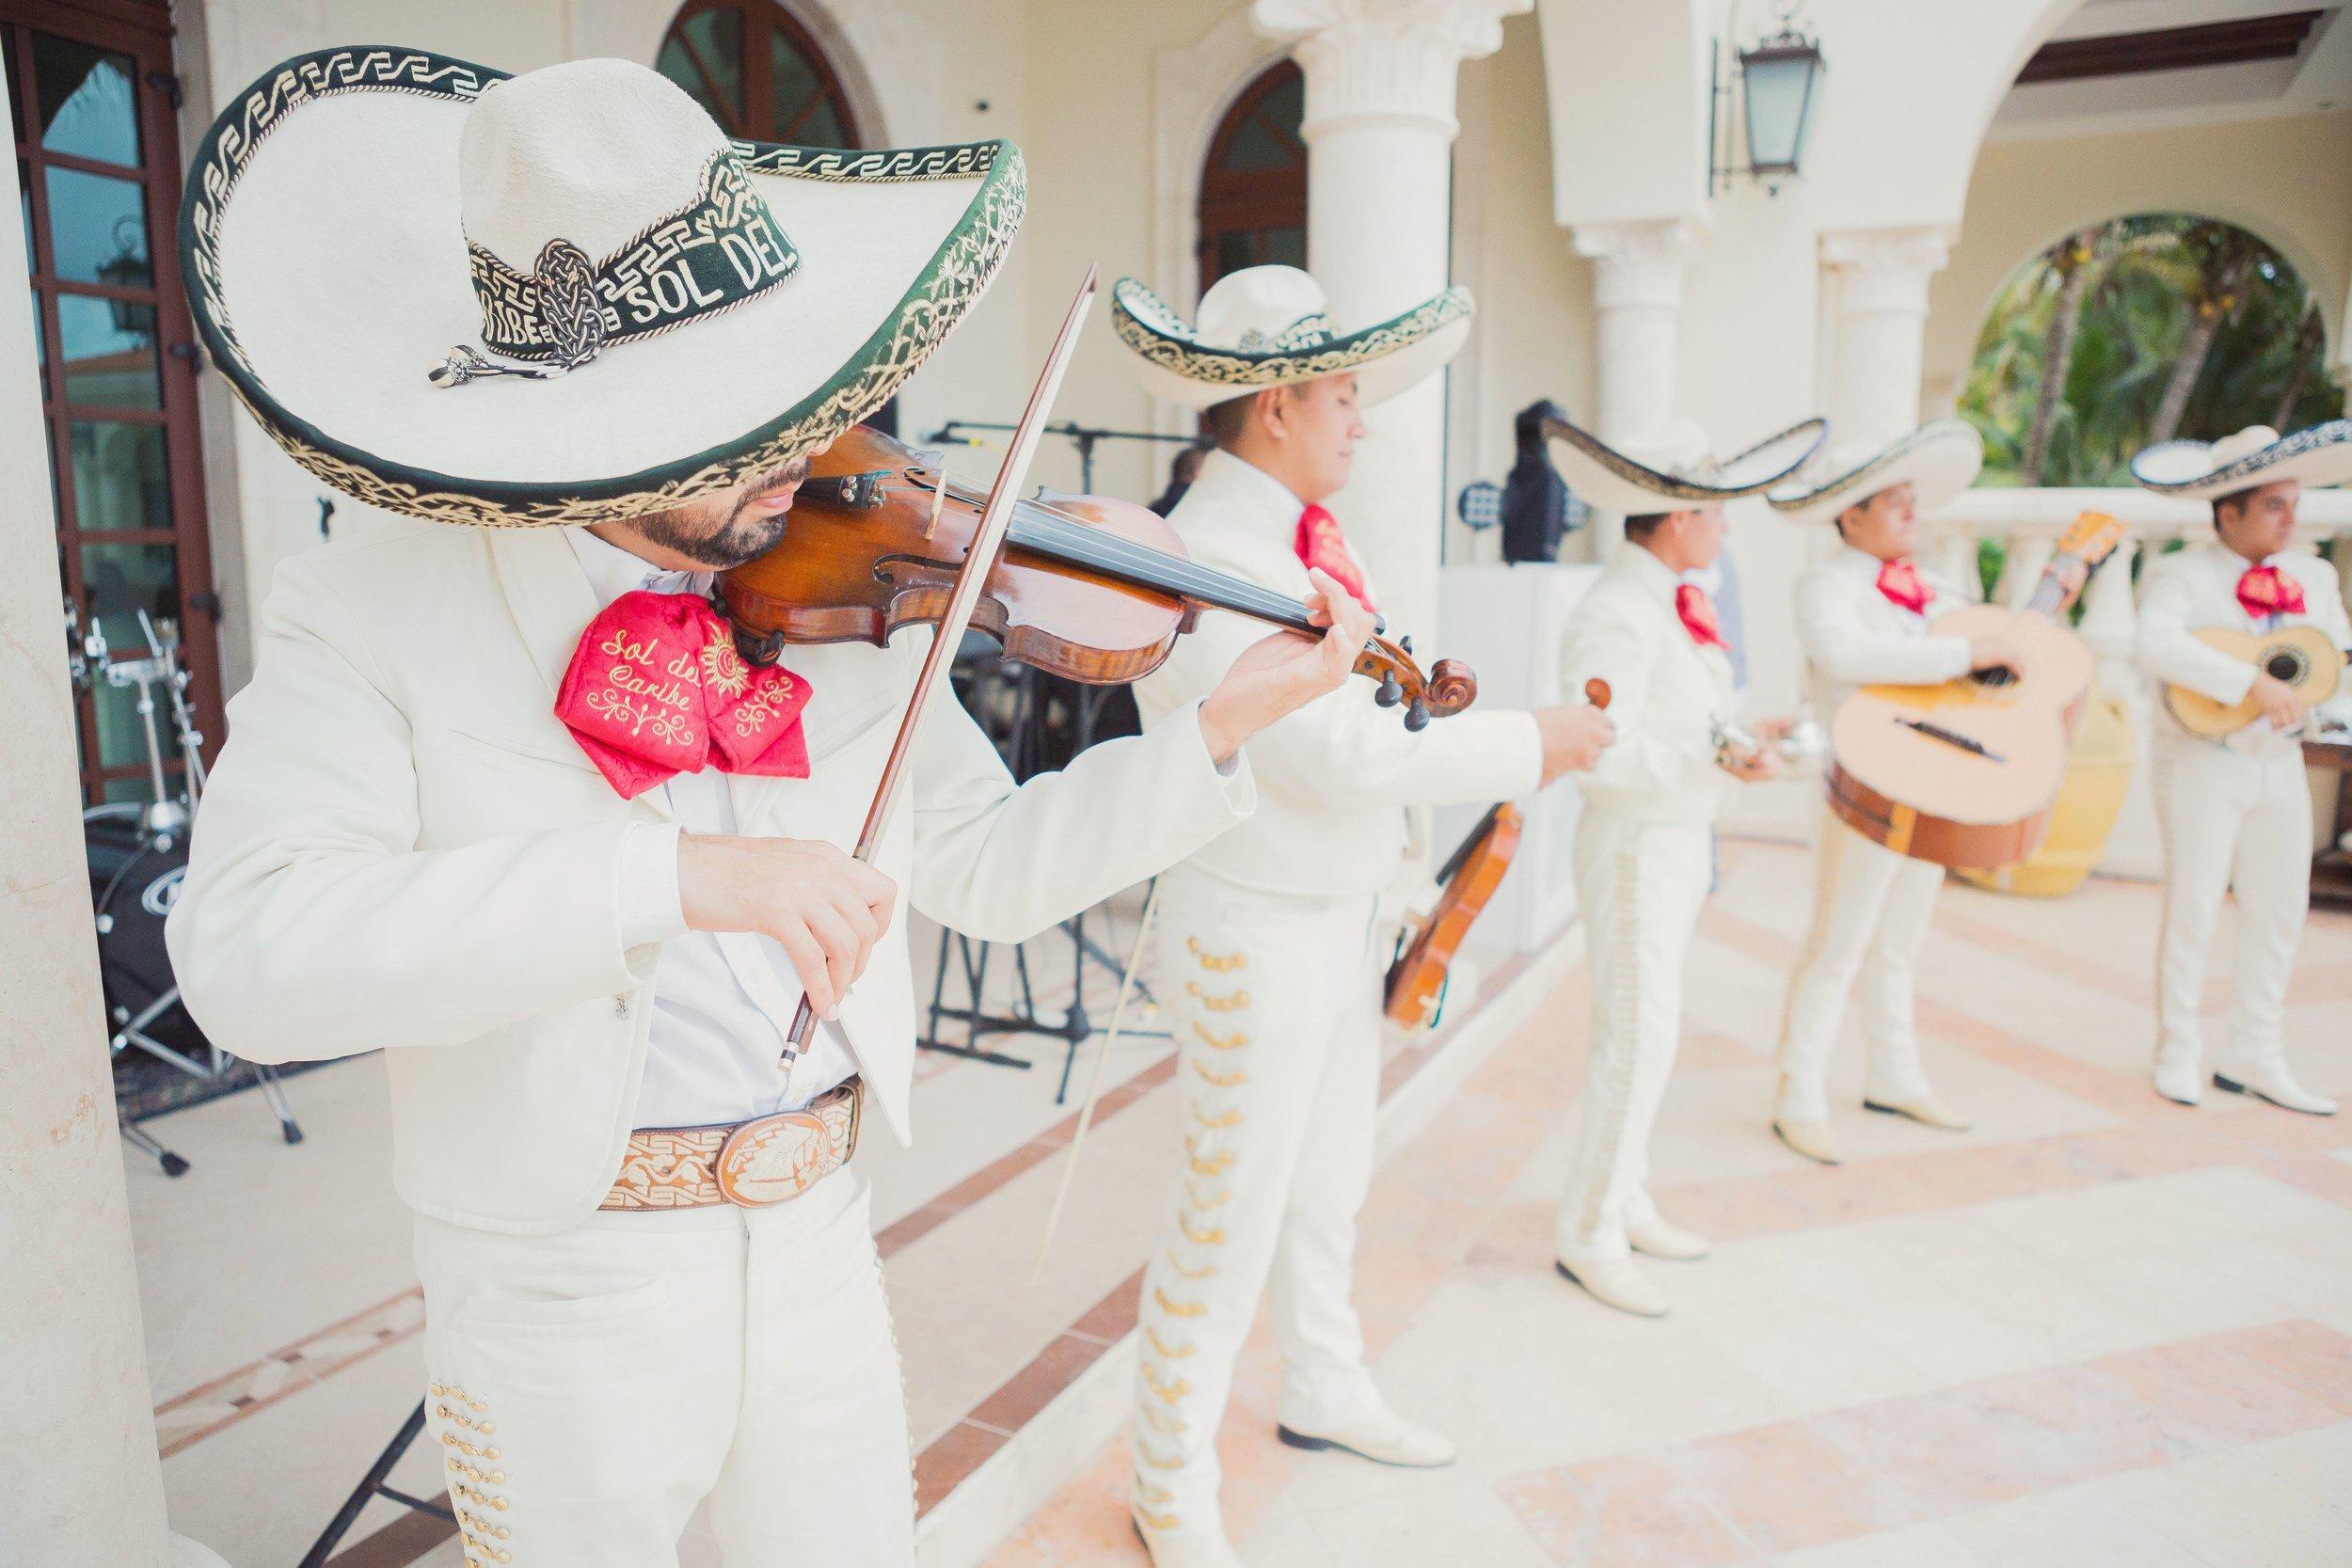 cancun-wedding-venue-villa-la-joya-952 copy-websize.jpg